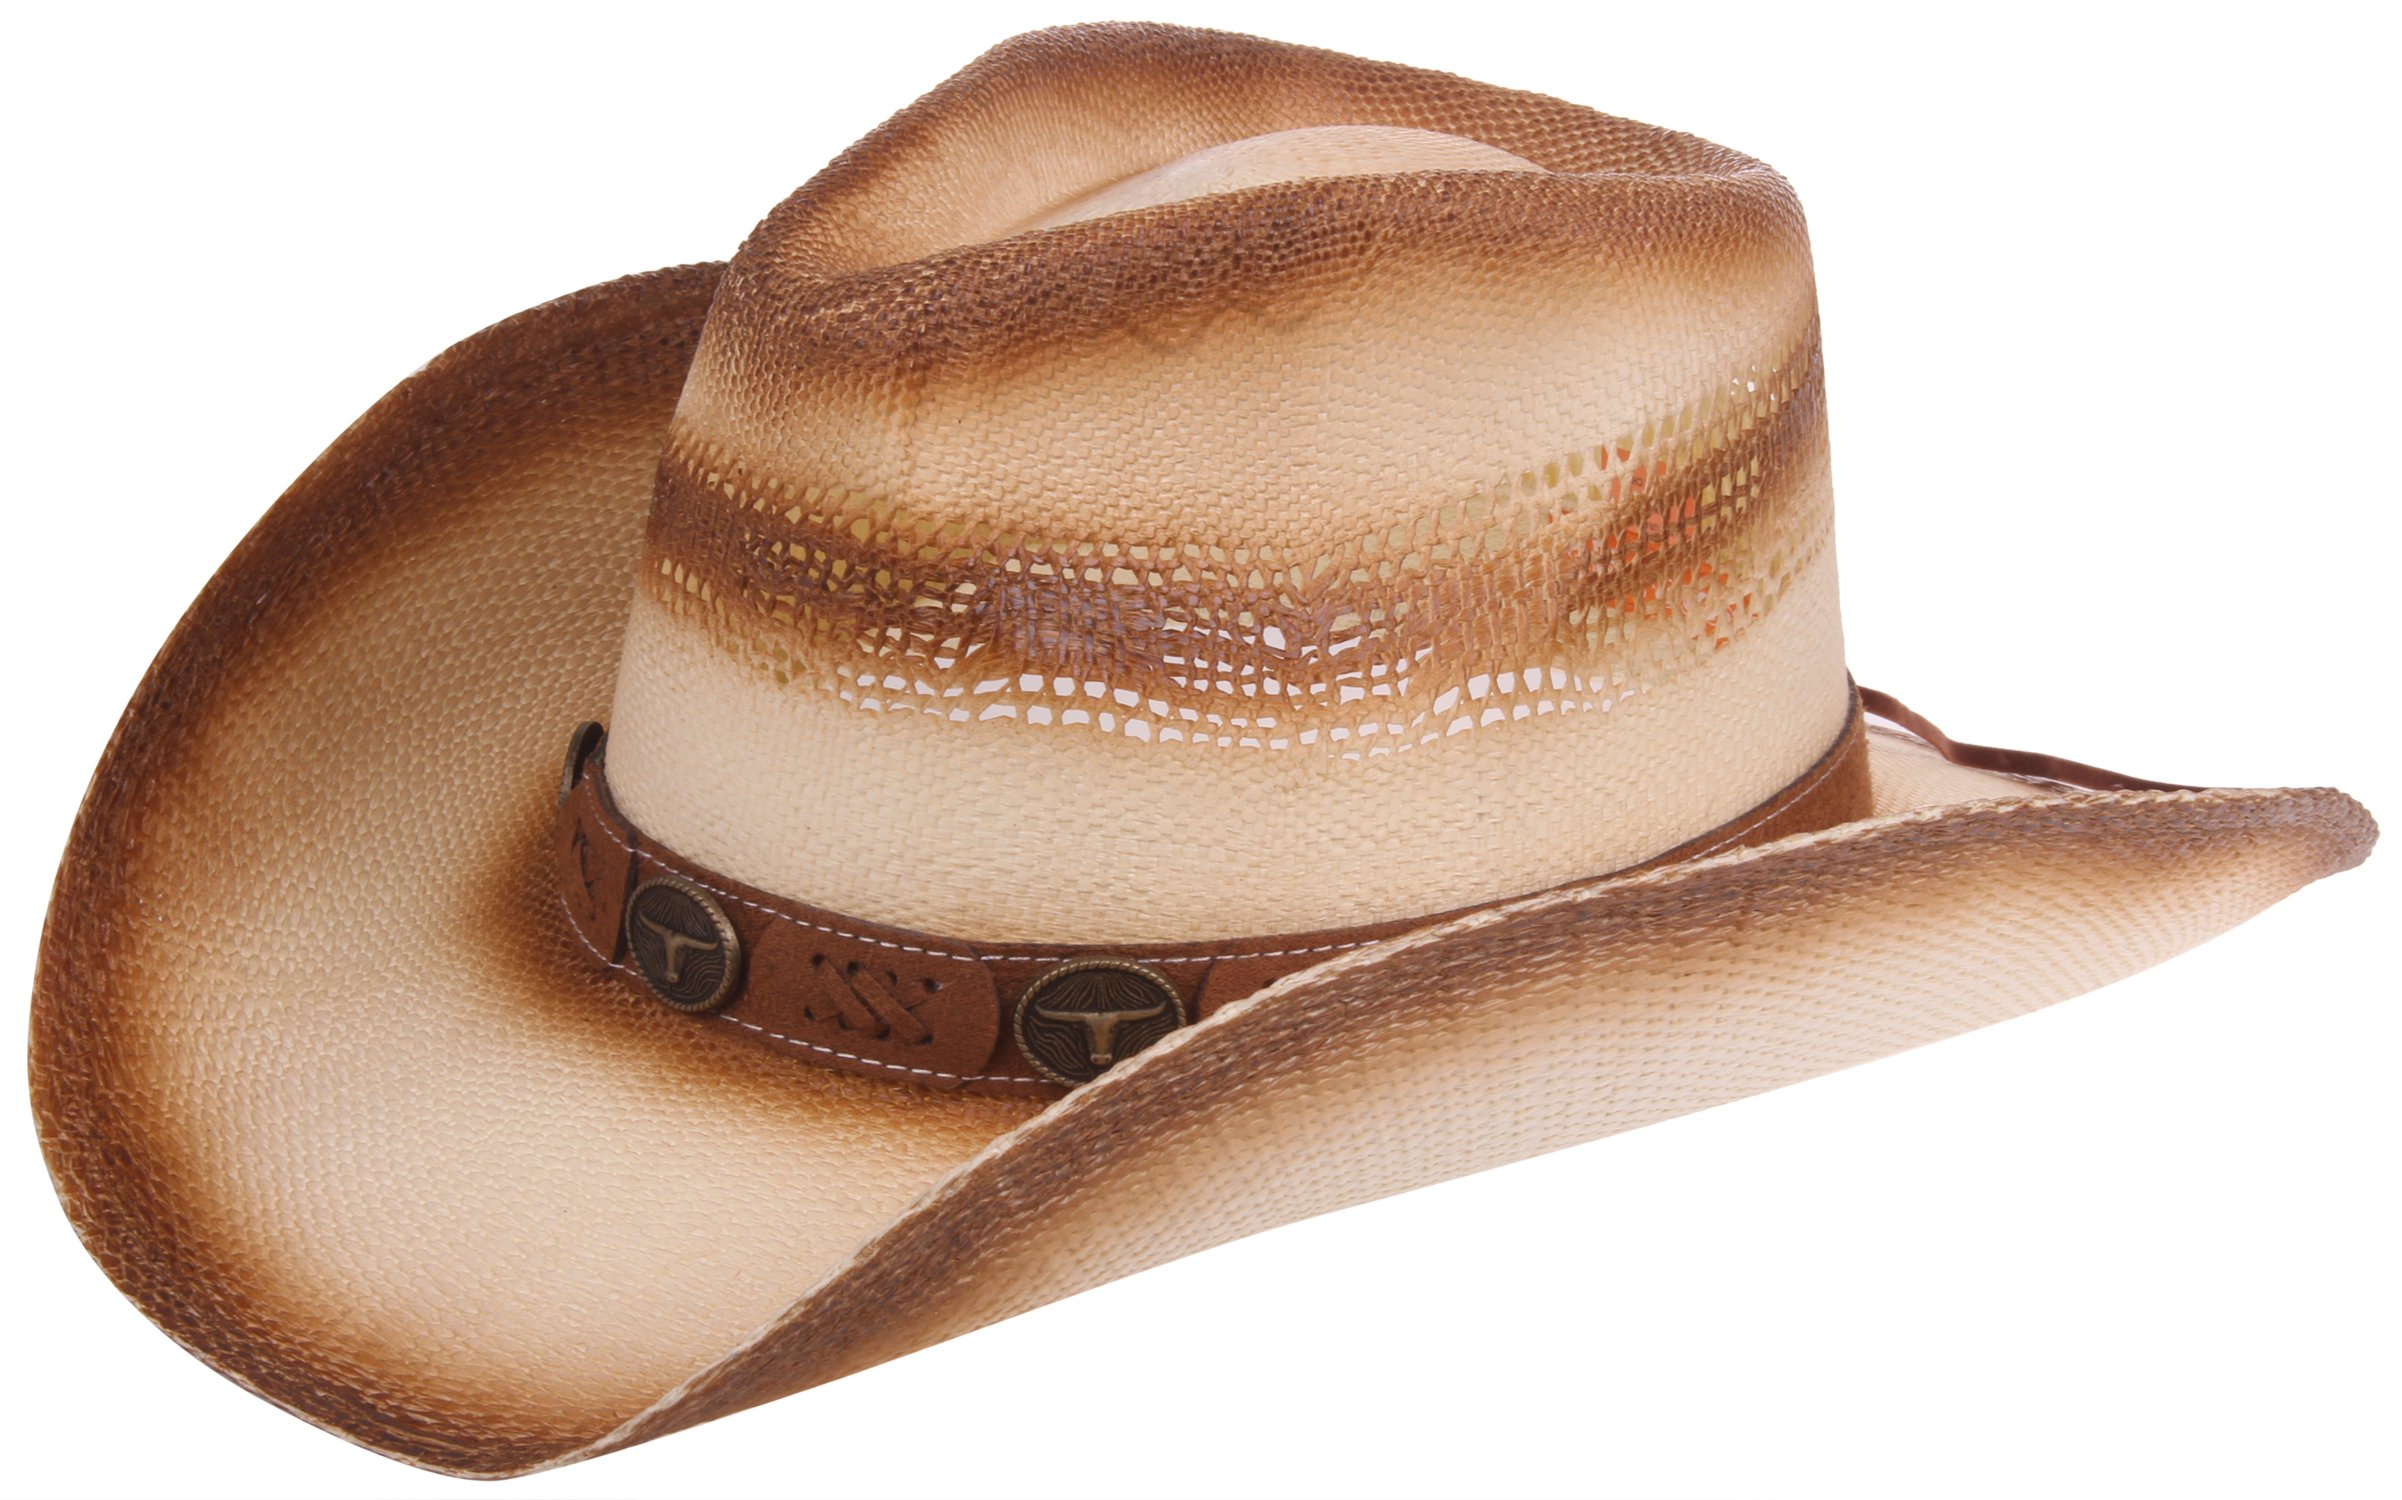 Enimay Western Outback Cowboy Hat Men's Women's Style Straw Felt Canvas Western Bull One Size